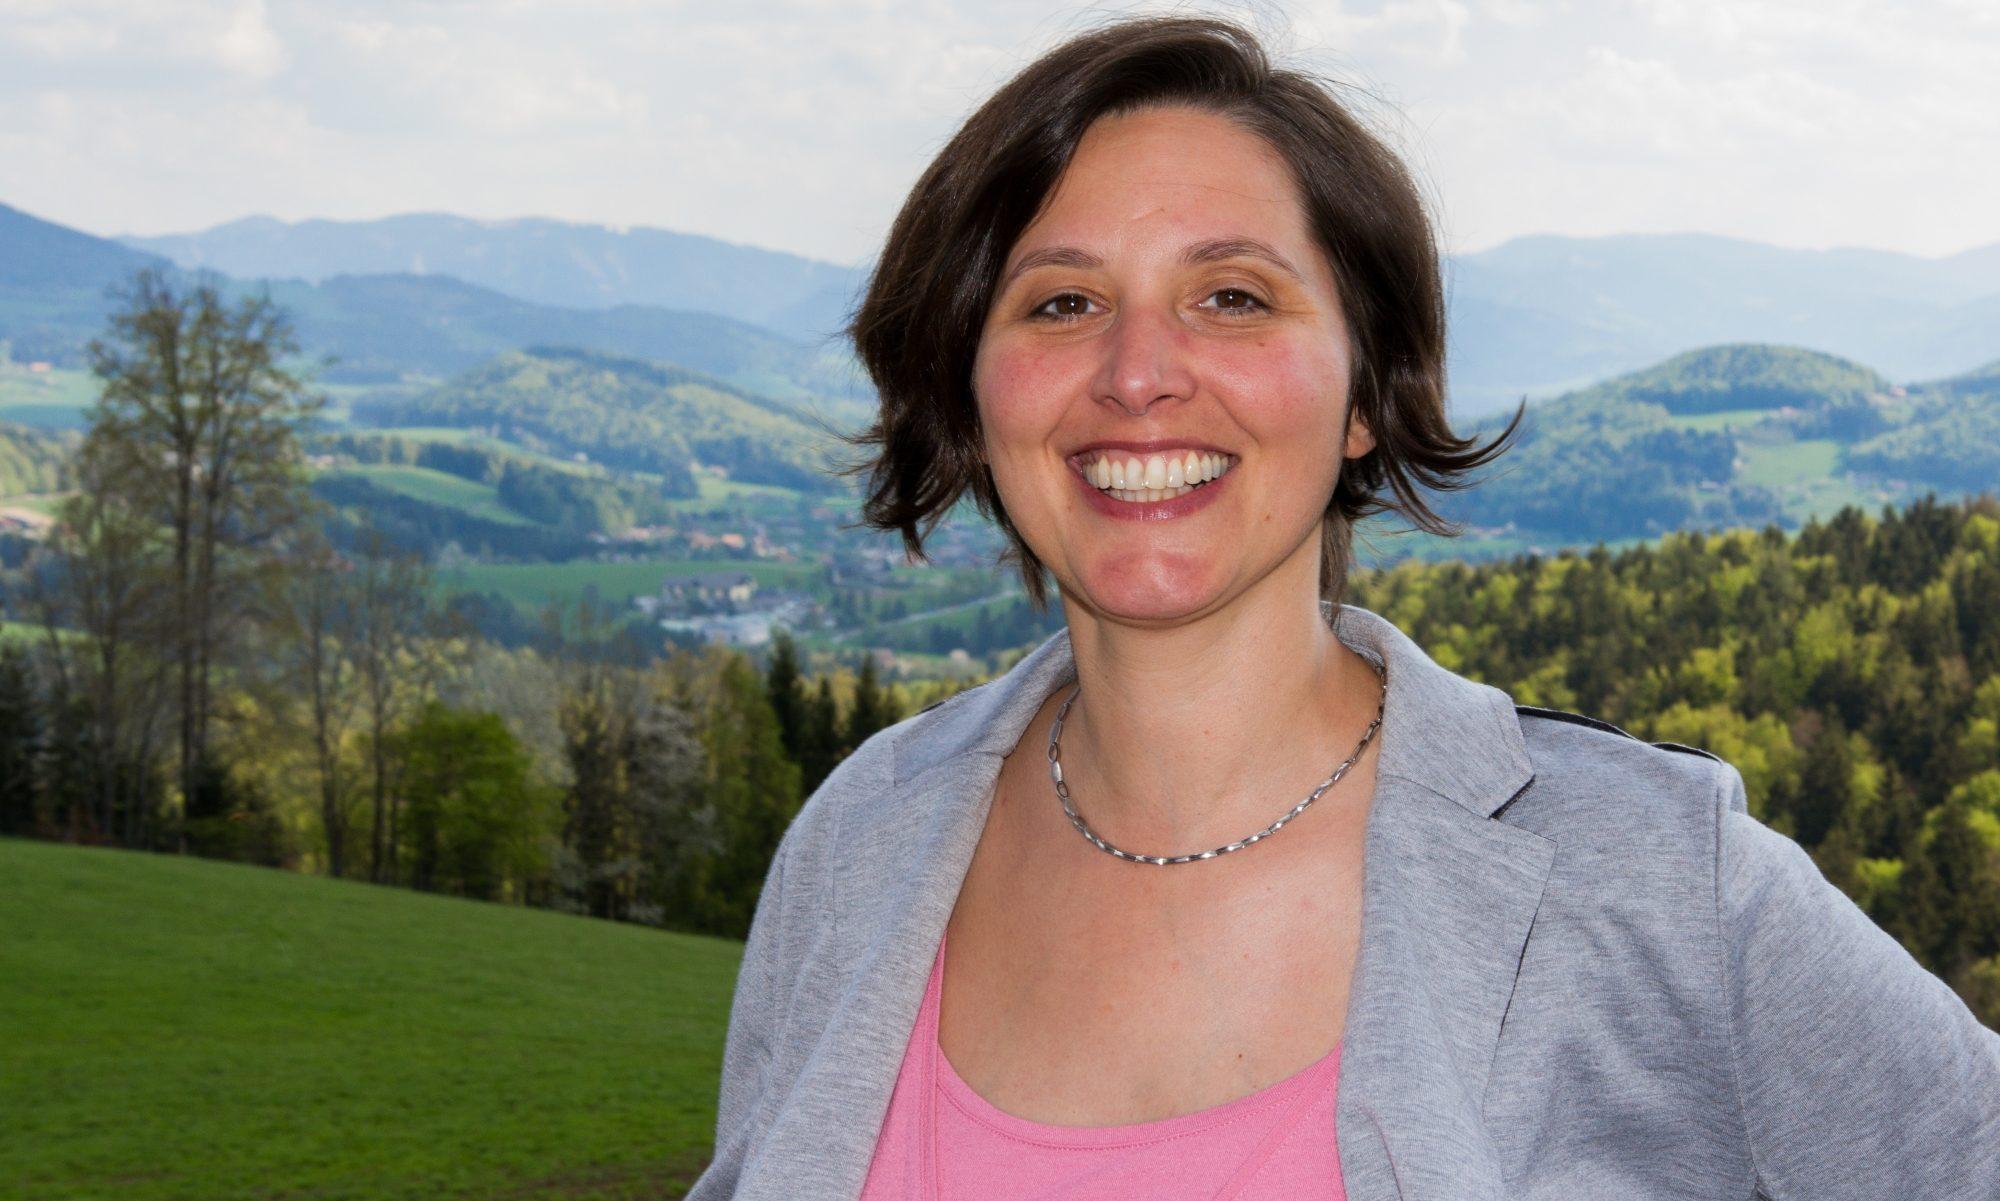 Daniela Trieb